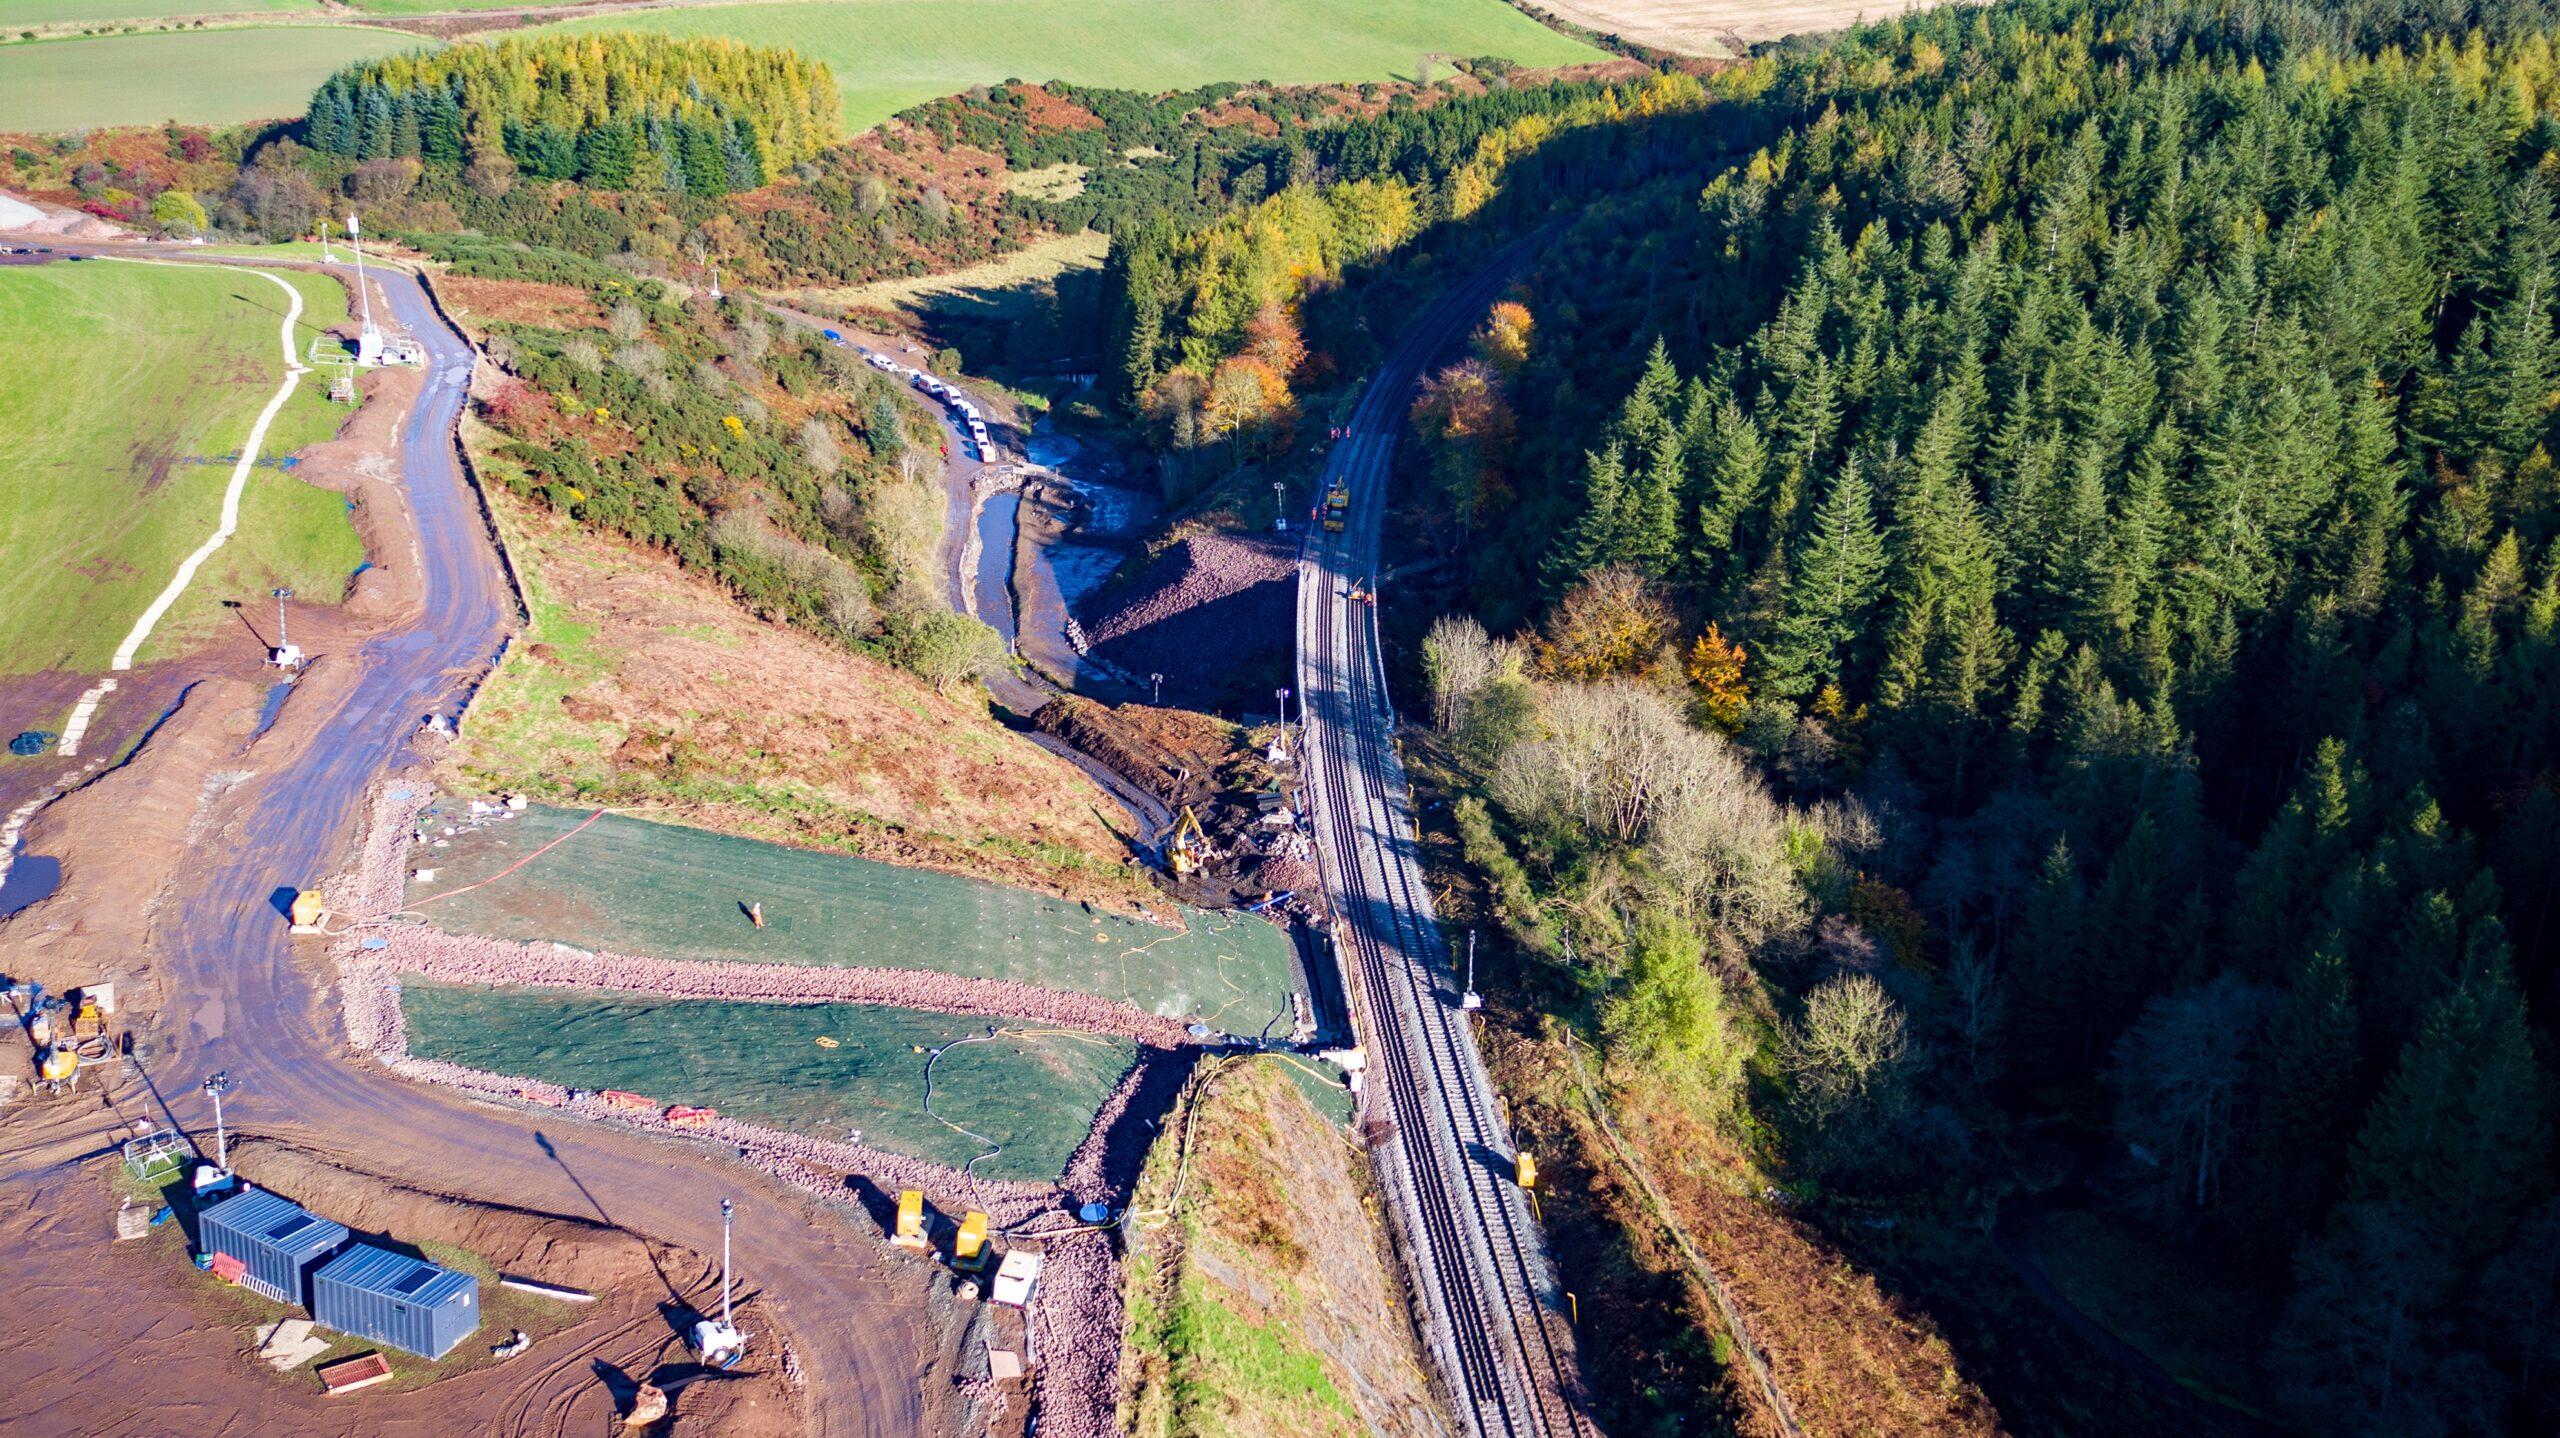 Stonehaven derailment site on 30 October 2020